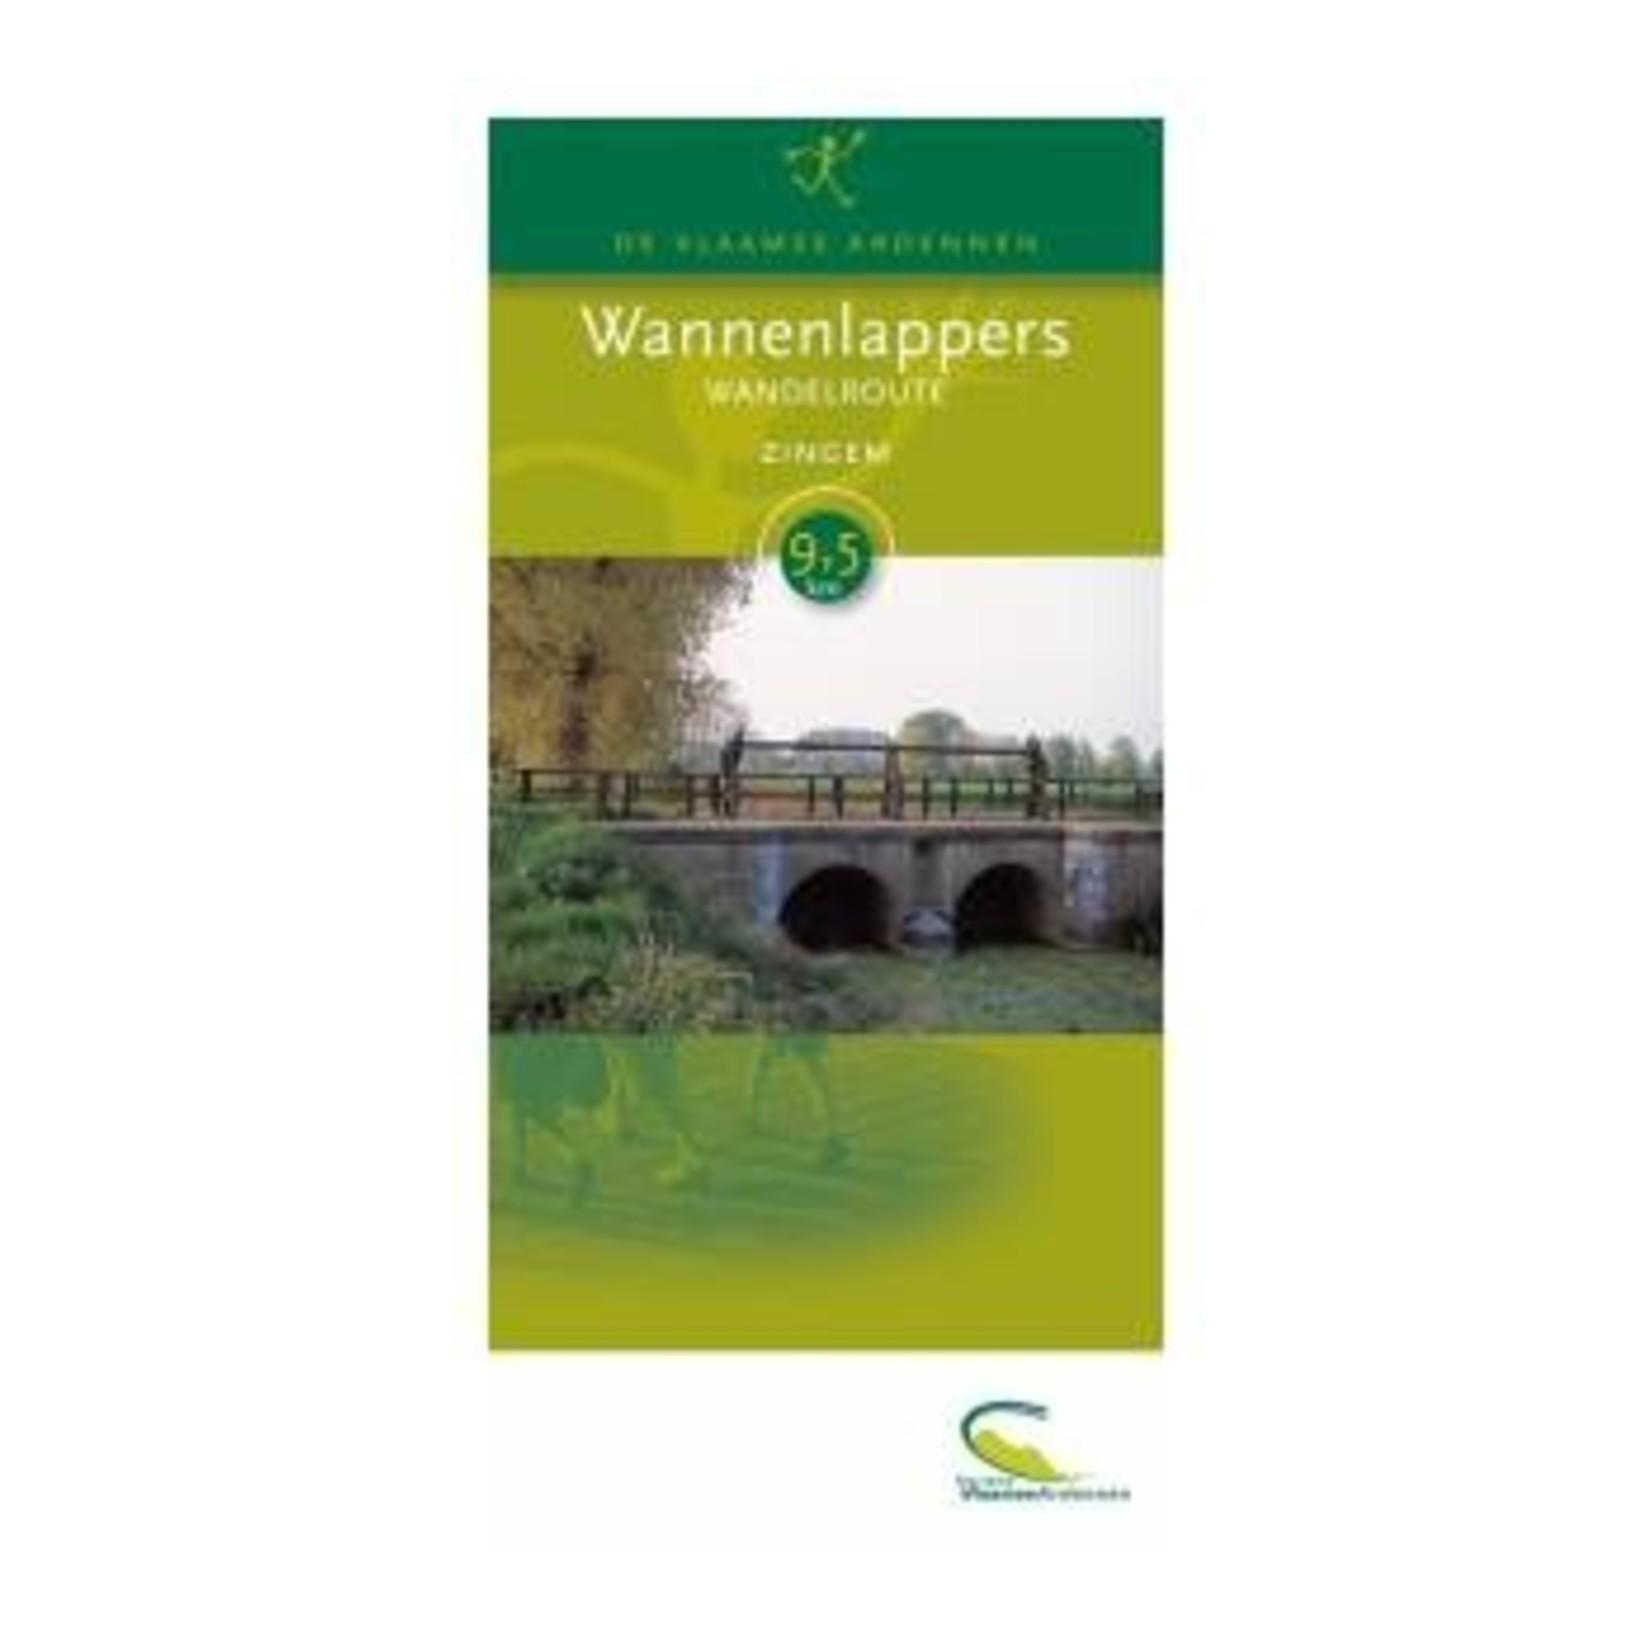 Kaart met wandelroute 'Wannenlappers' (Zingem)